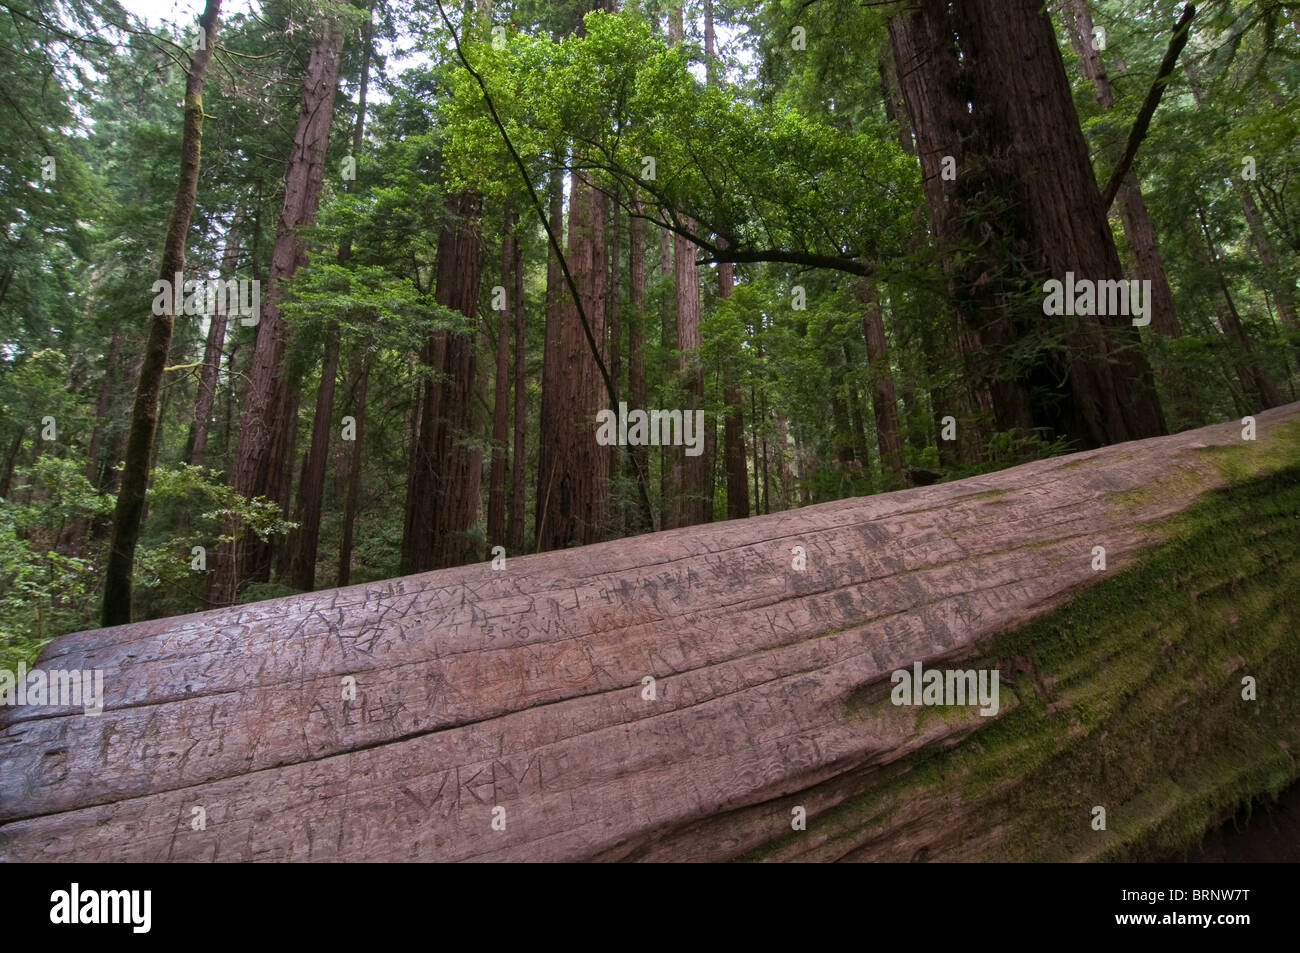 Vegetation and Coastal Redwoods, Sequoia sempervirens, Muir Woods National Park, California, USA - Stock Image